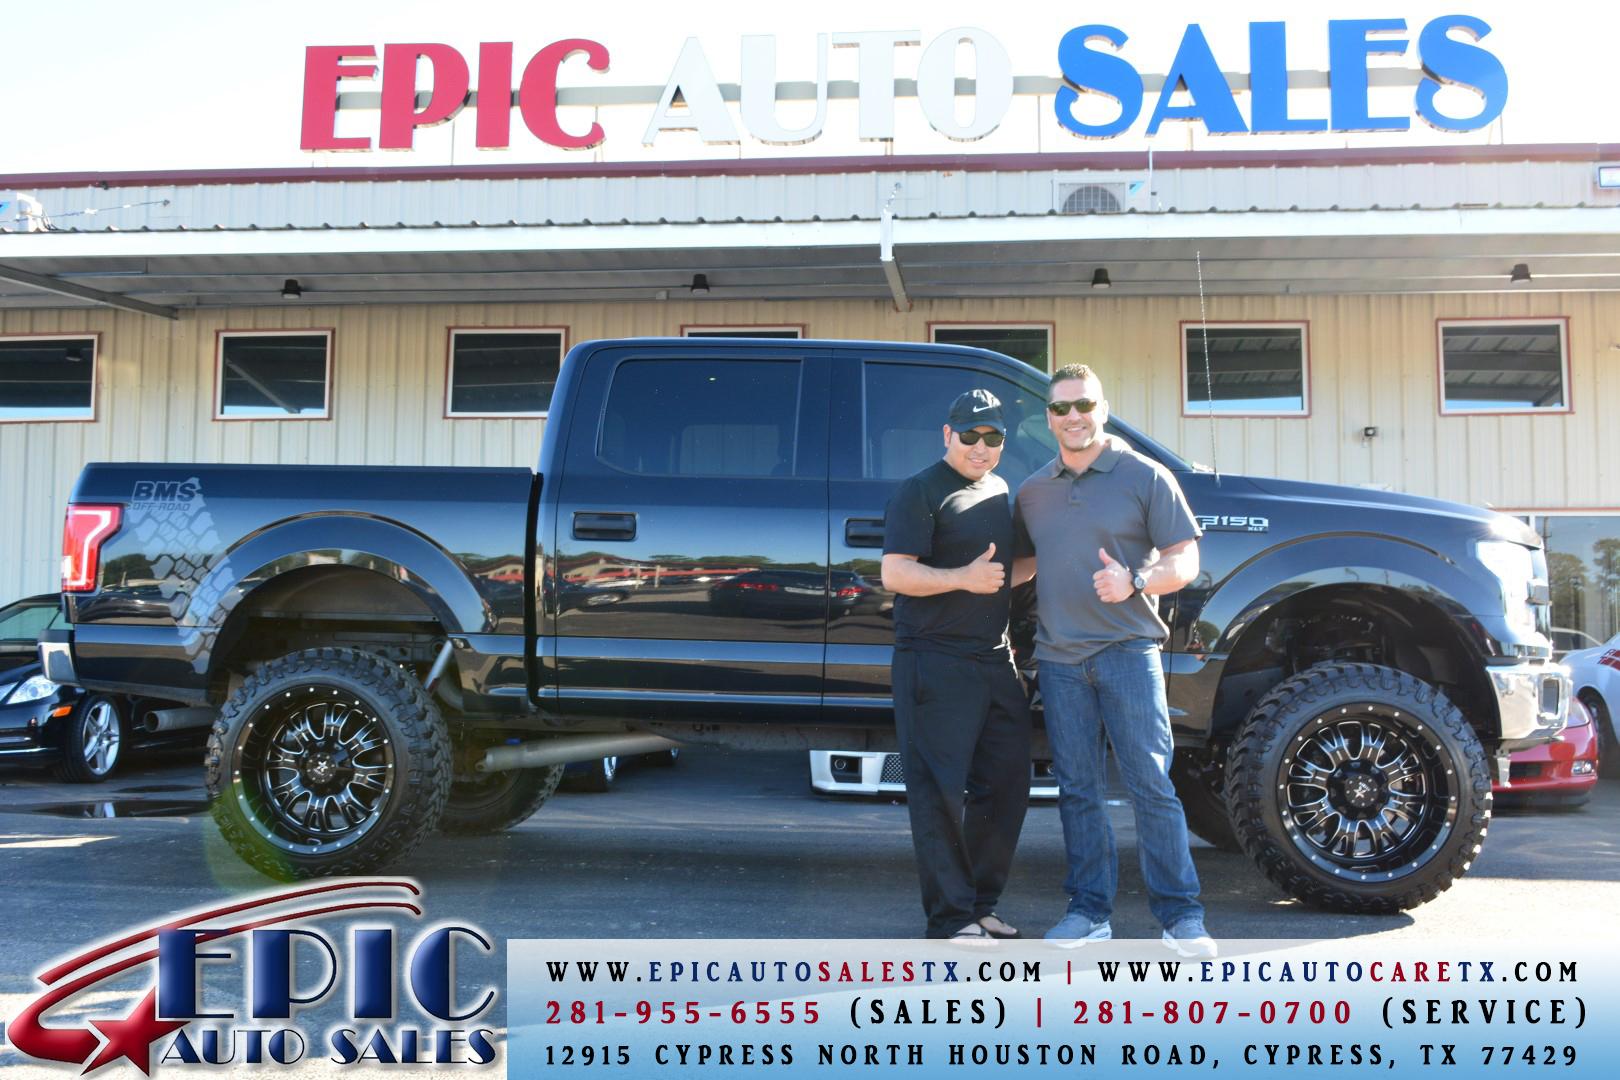 Epic Auto Sales image 14